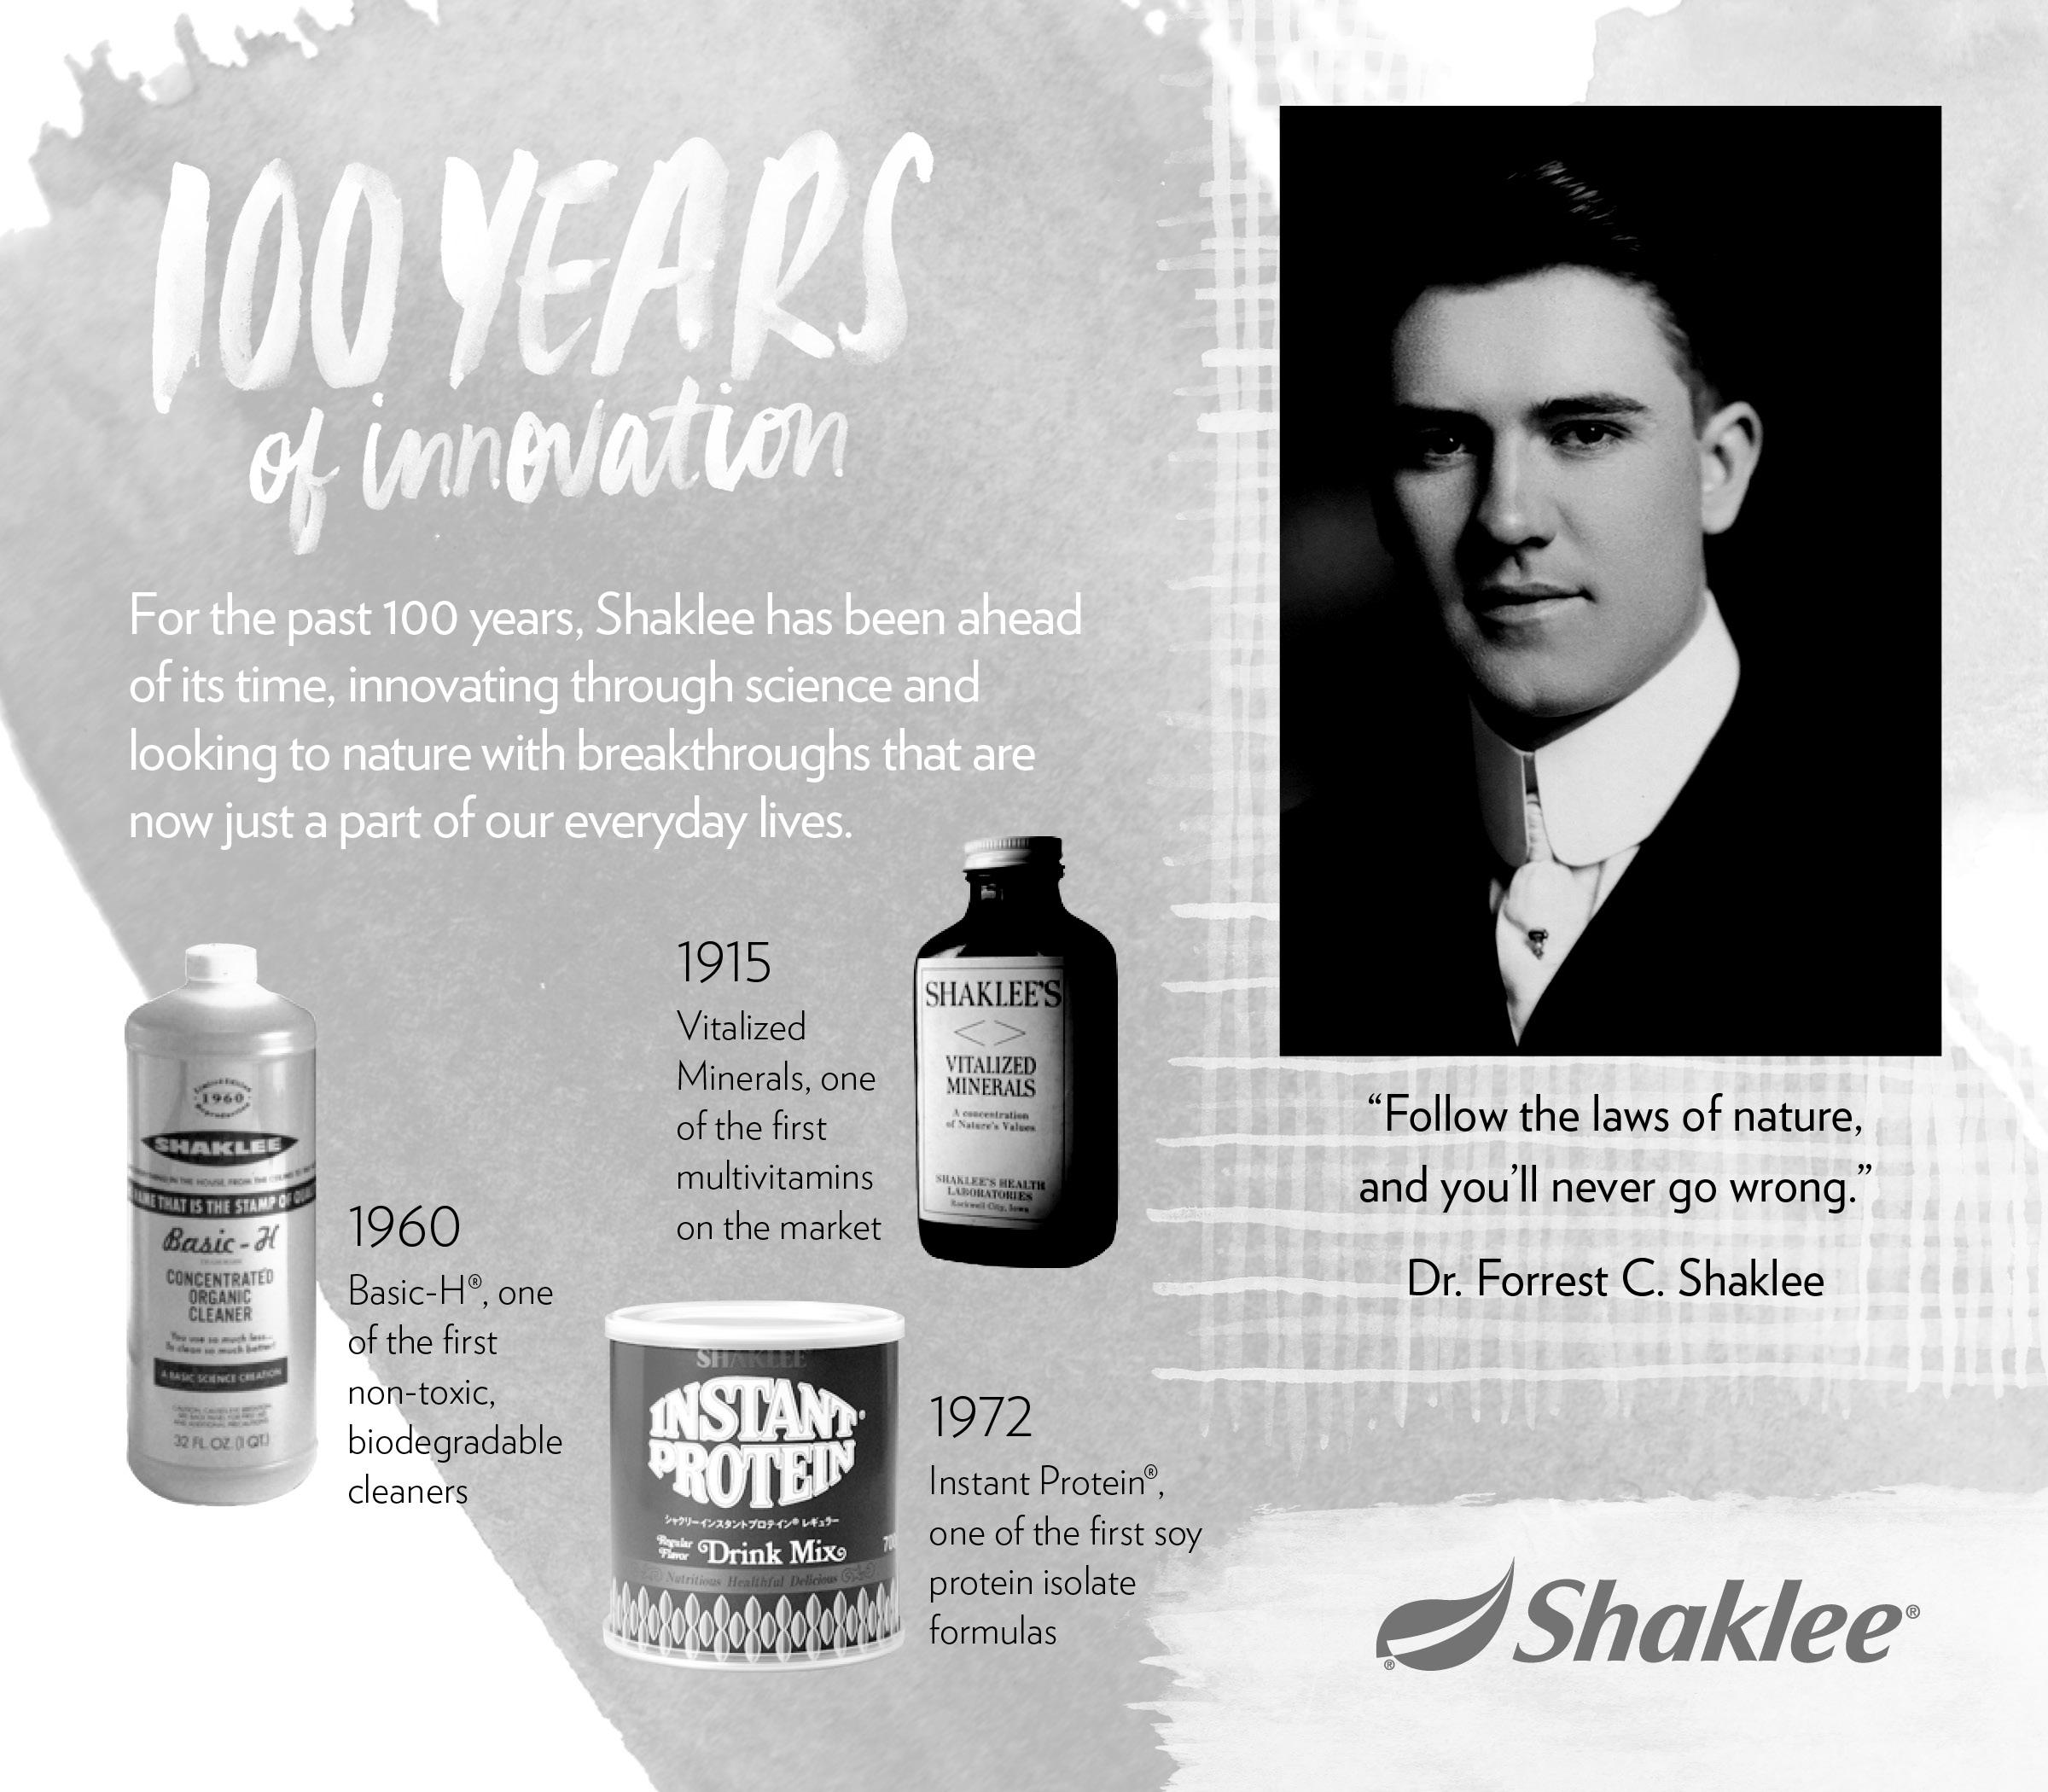 shaklee 100 years